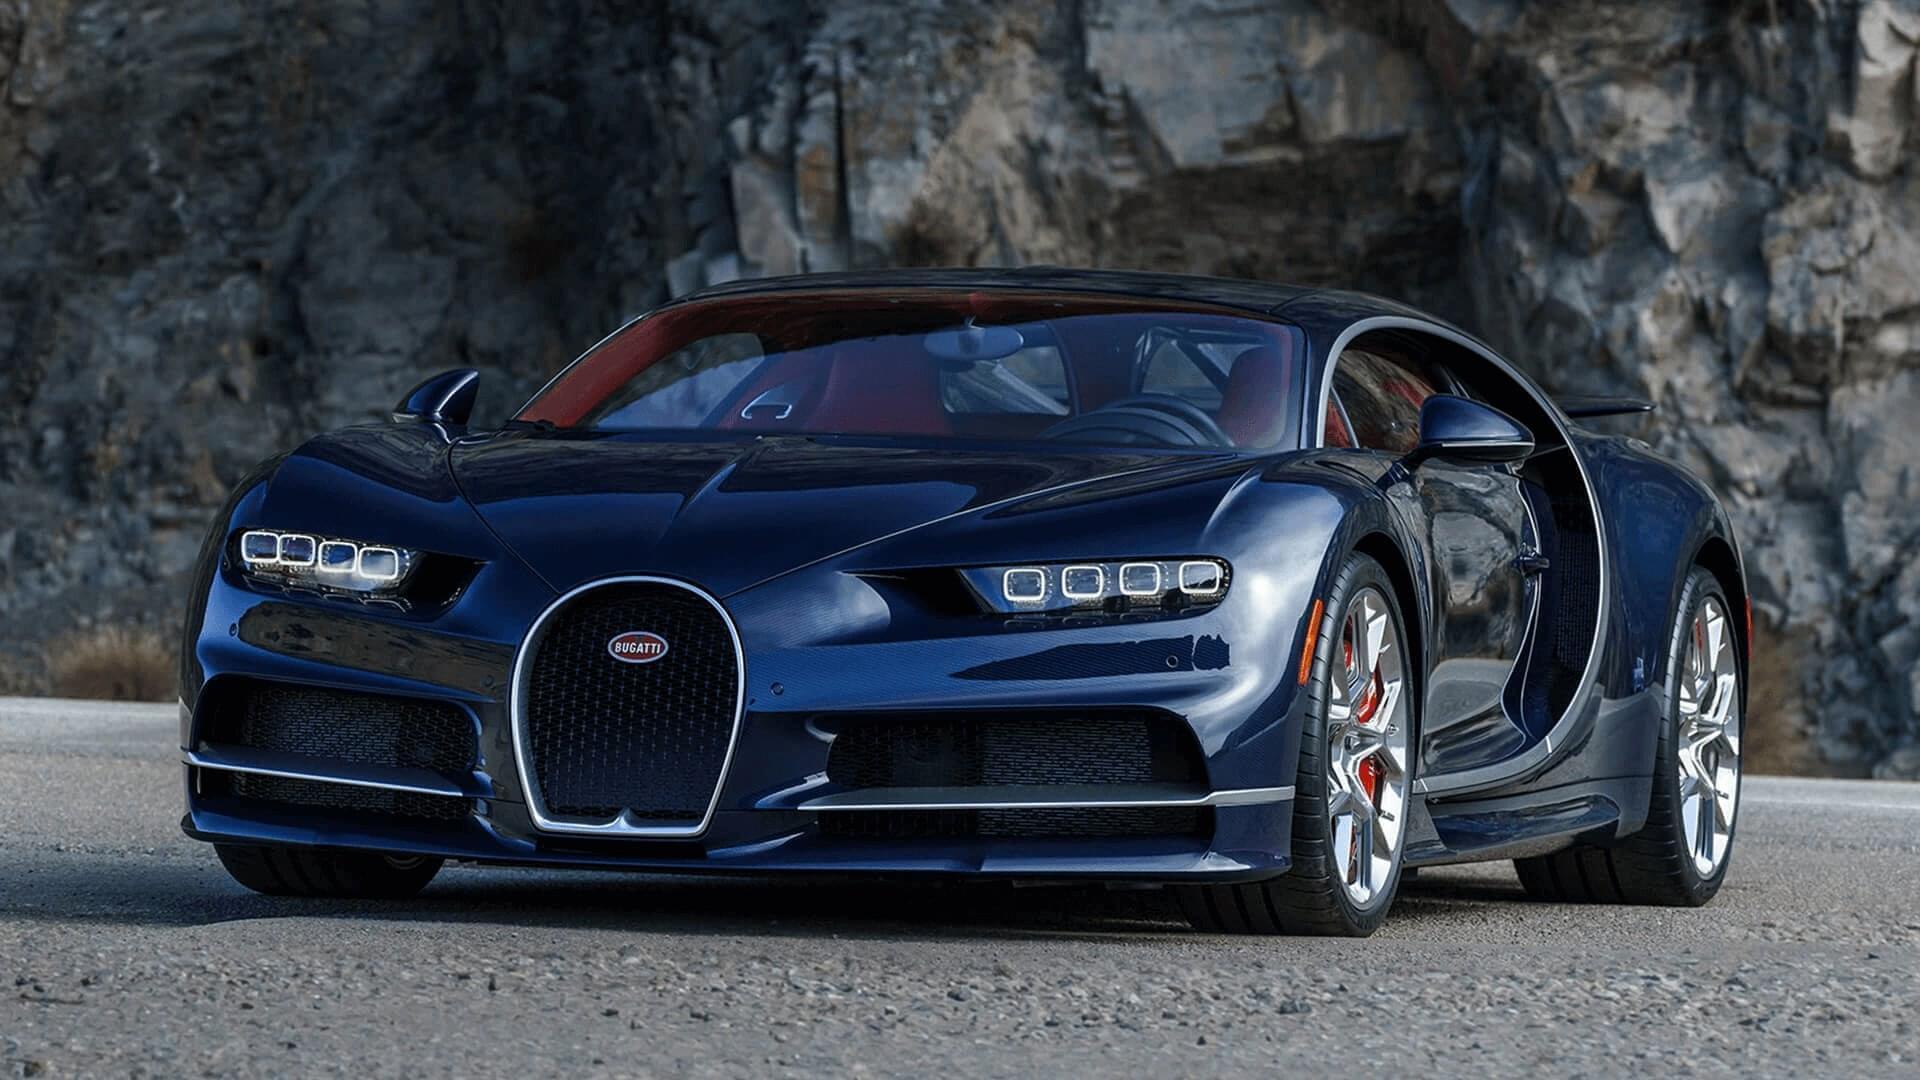 Berapa Ya Kira-Kira Biaya Ganti Oli Bugatti Veyron ?